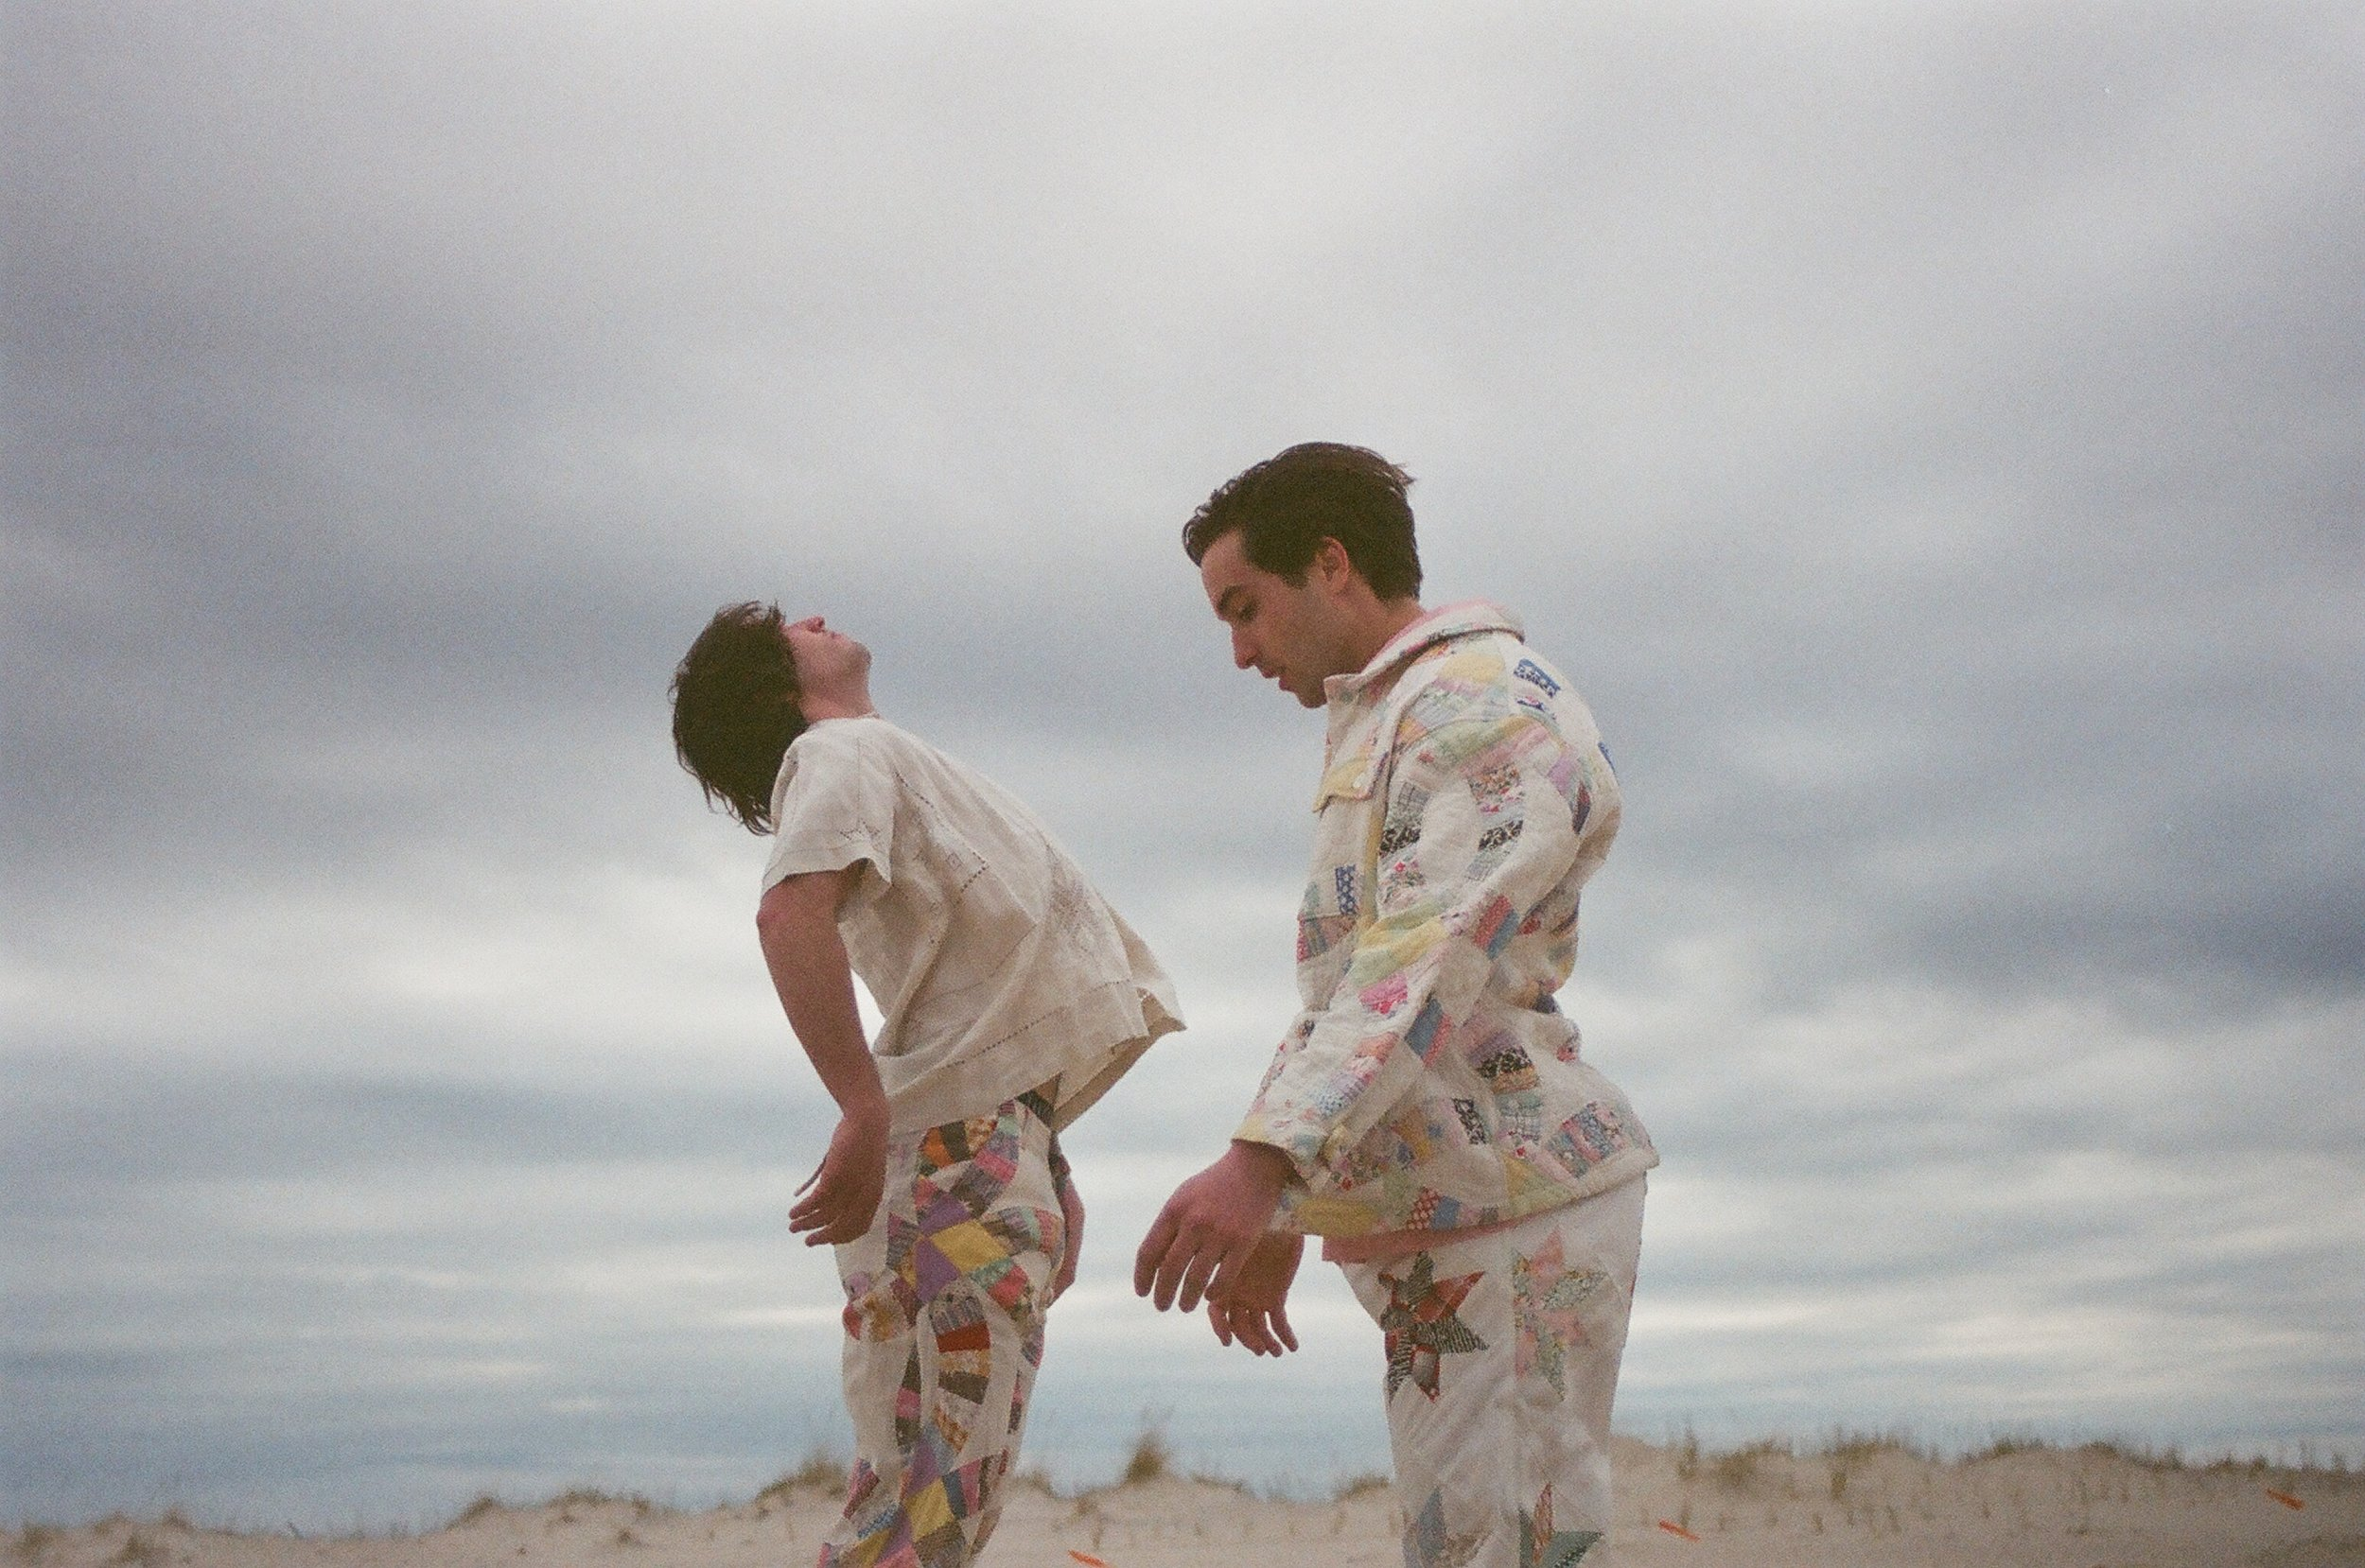 Chelsy-Mitchel-photographer-bode-nyc-fashion-beach-editorial-beachside-car-christian-matthew-rice.JPG